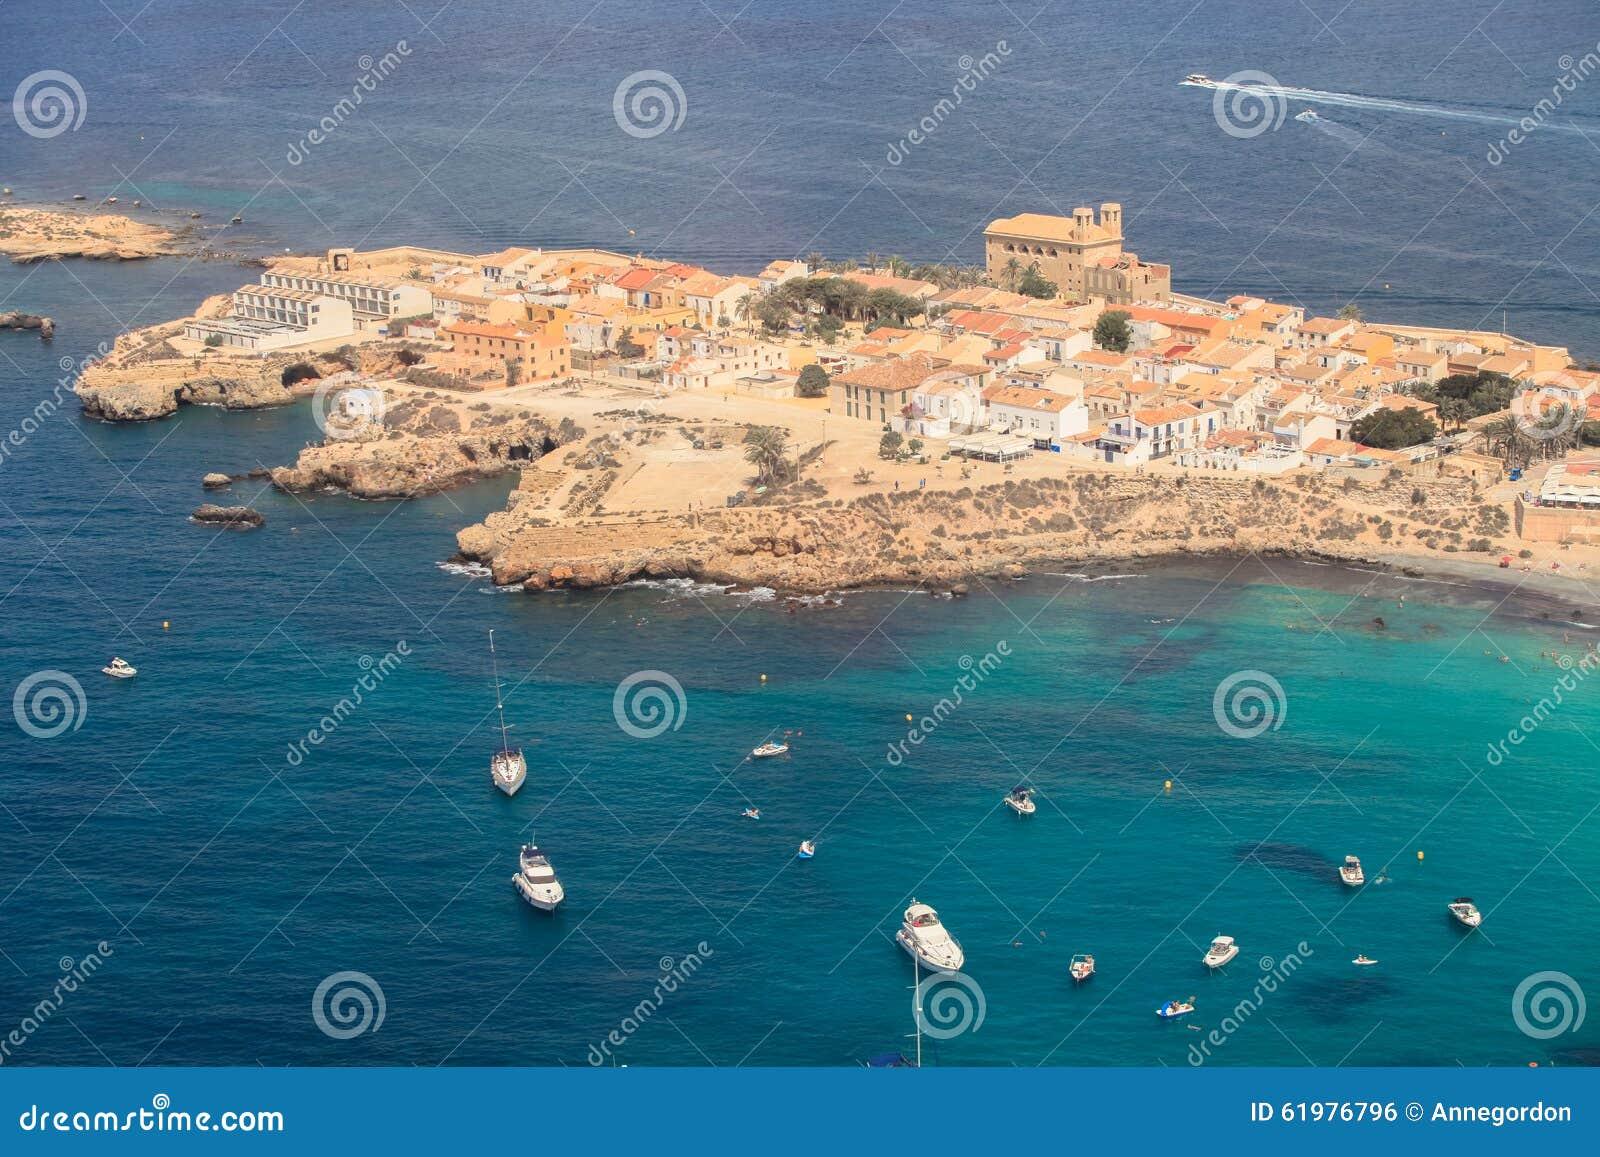 Île de Tabarca dans Alicante, Espagne